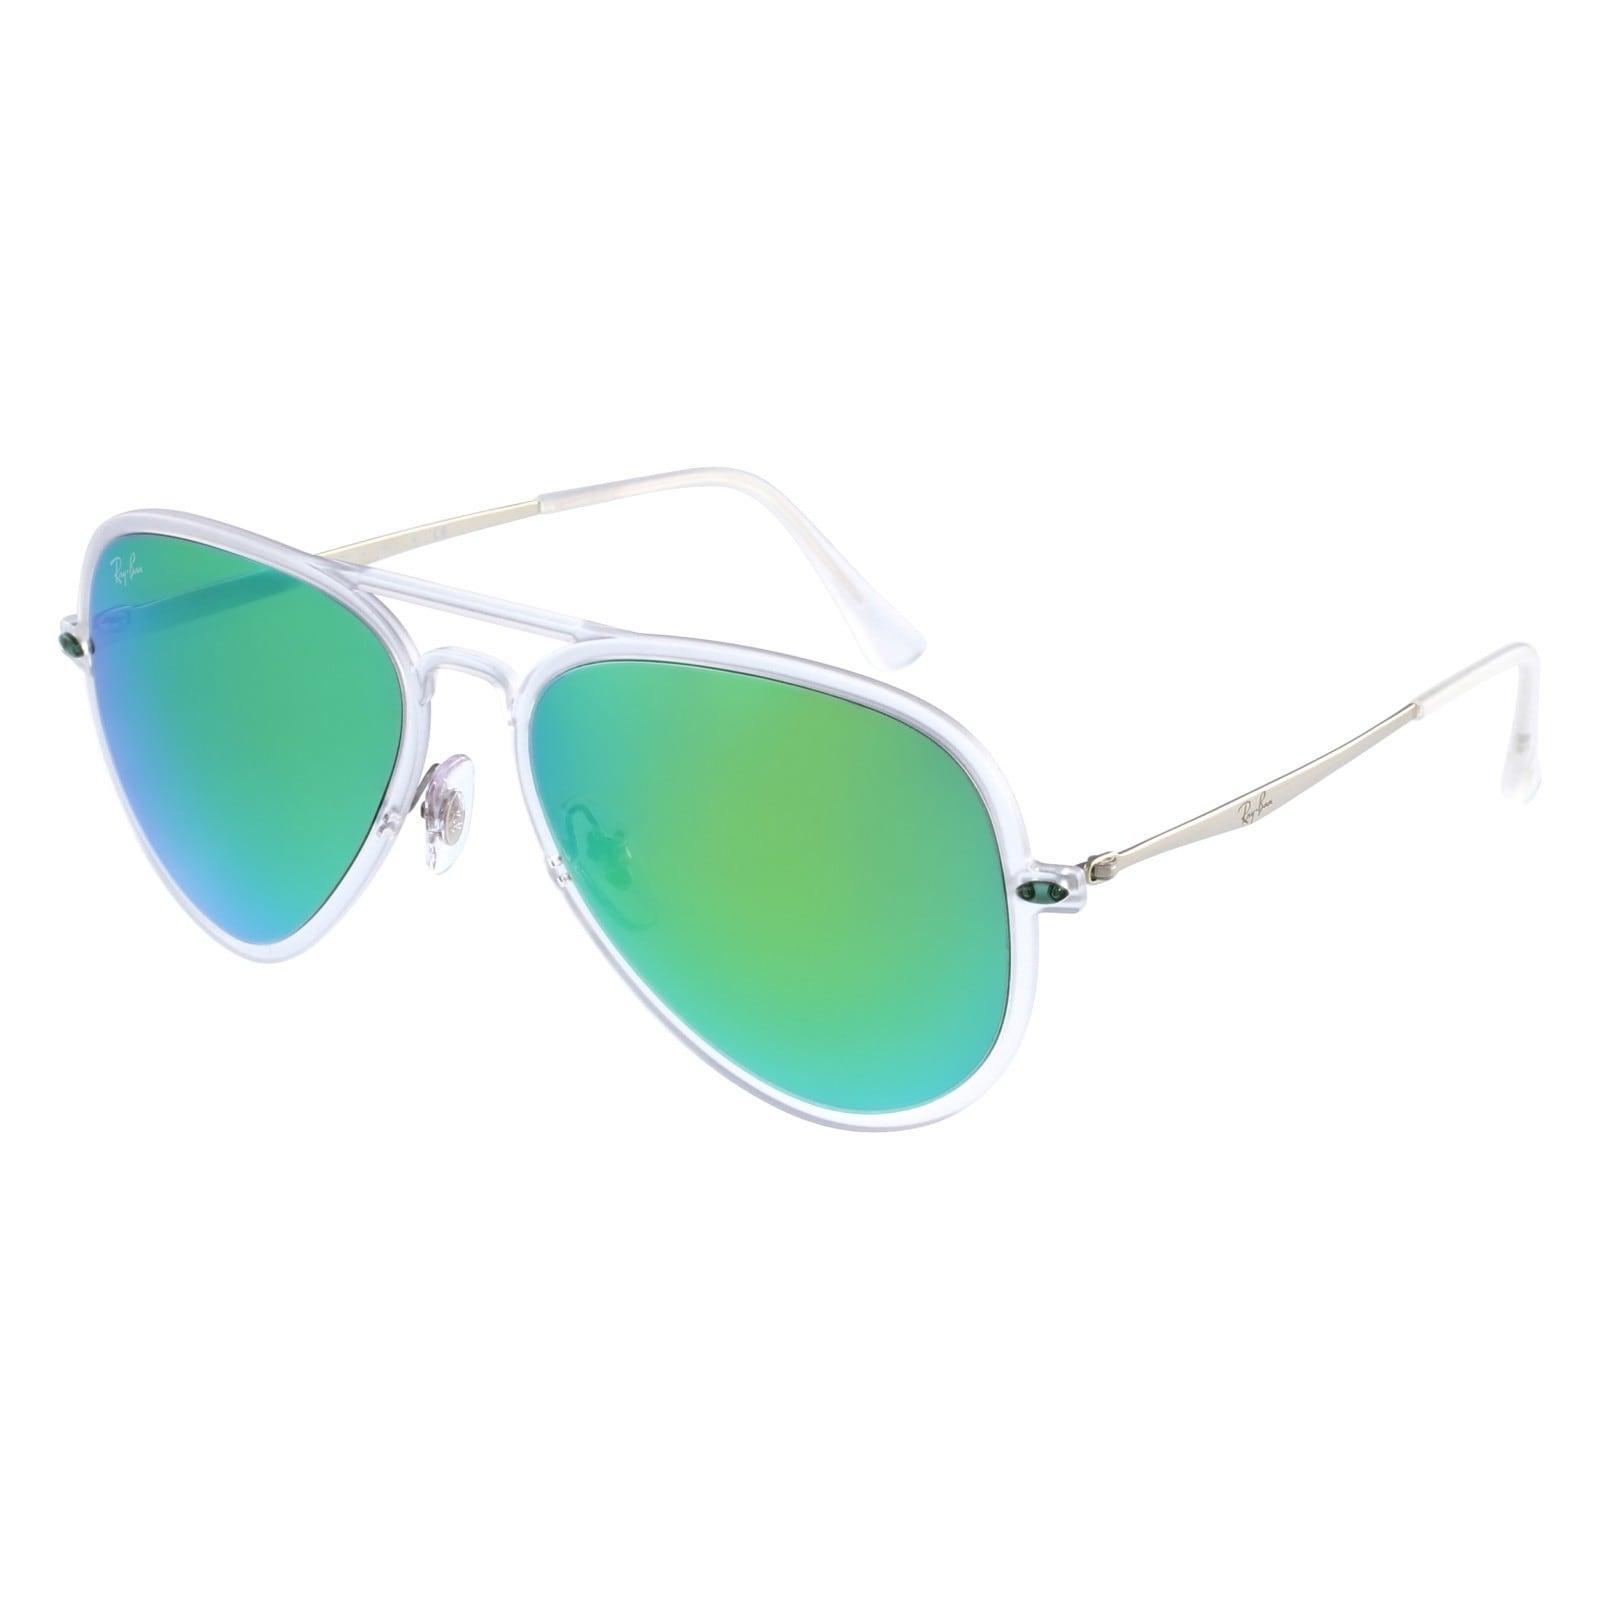 01db9e0da5de Shop Ray Ban RB4211 Aviator Light Ray II Green Mirror Sunglasses - Ships To  Canada - Overstock - 10289623